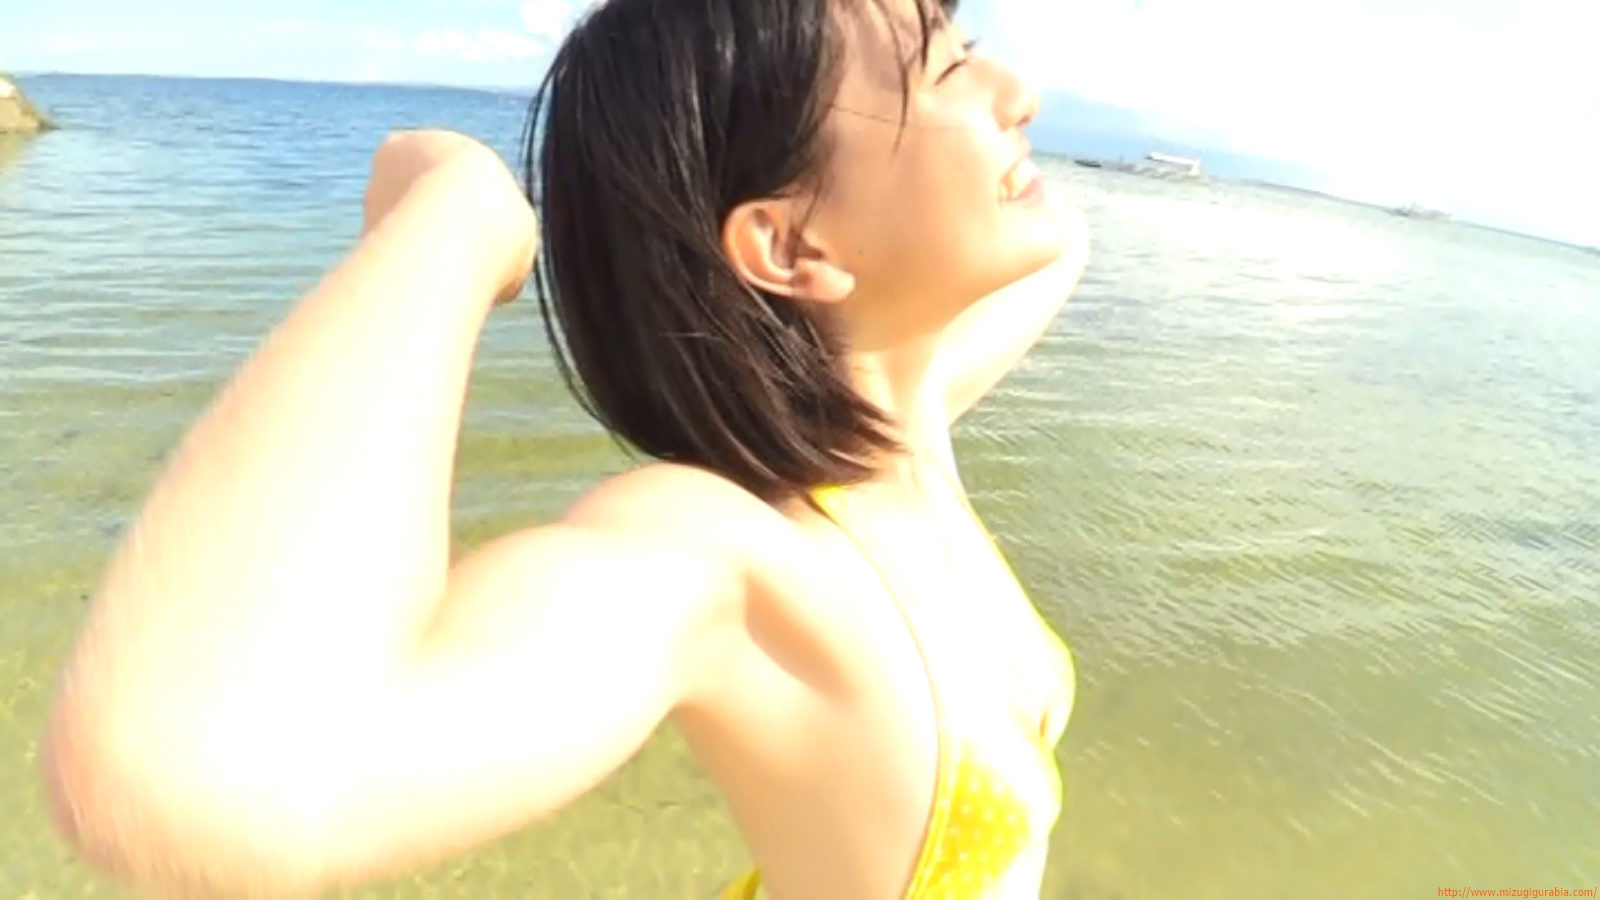 Beach dating354